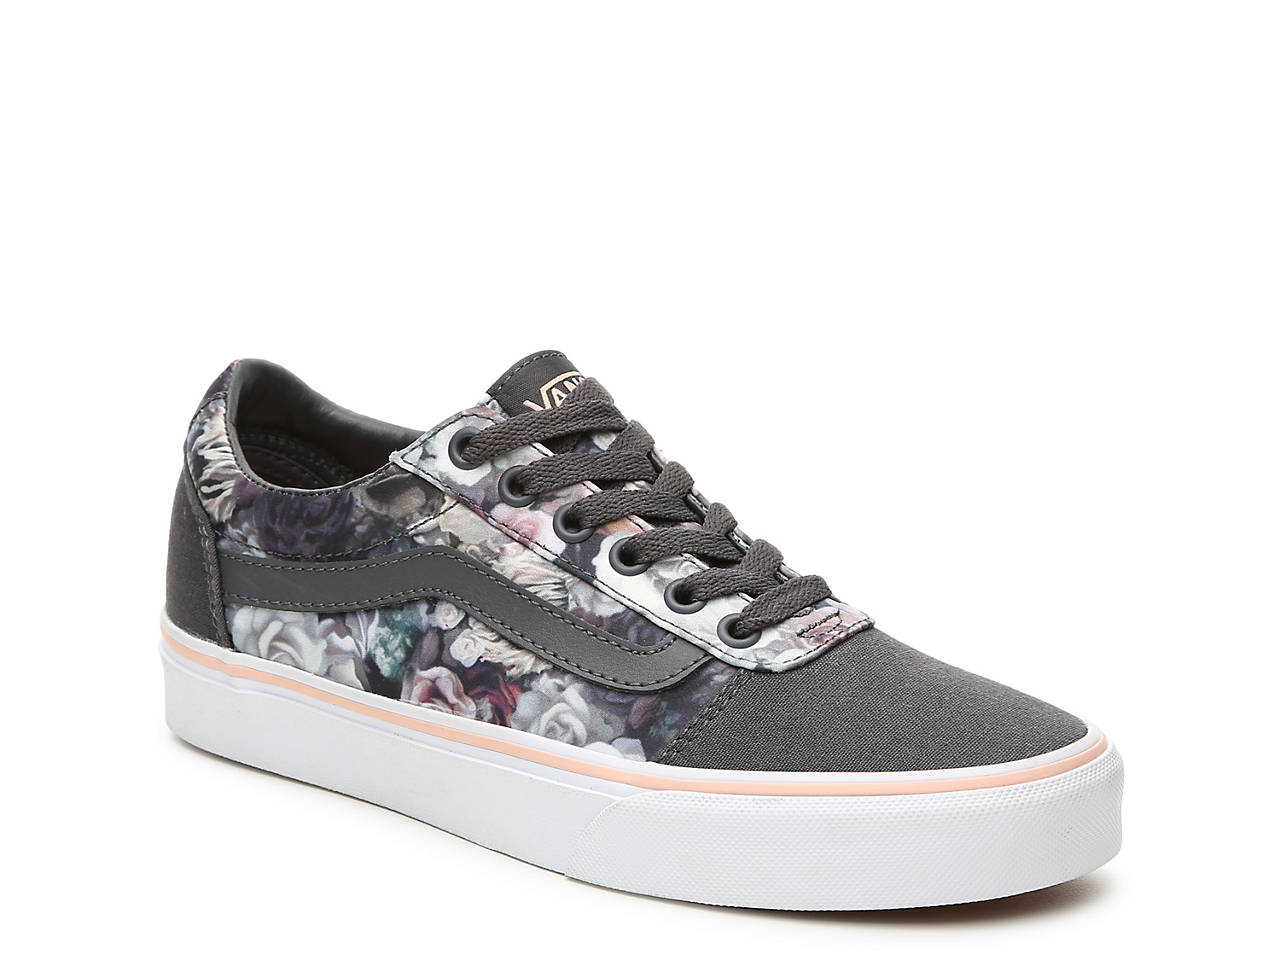 8ce98912143c Vans Ward Lo Sneaker - Women s Women s Shoes